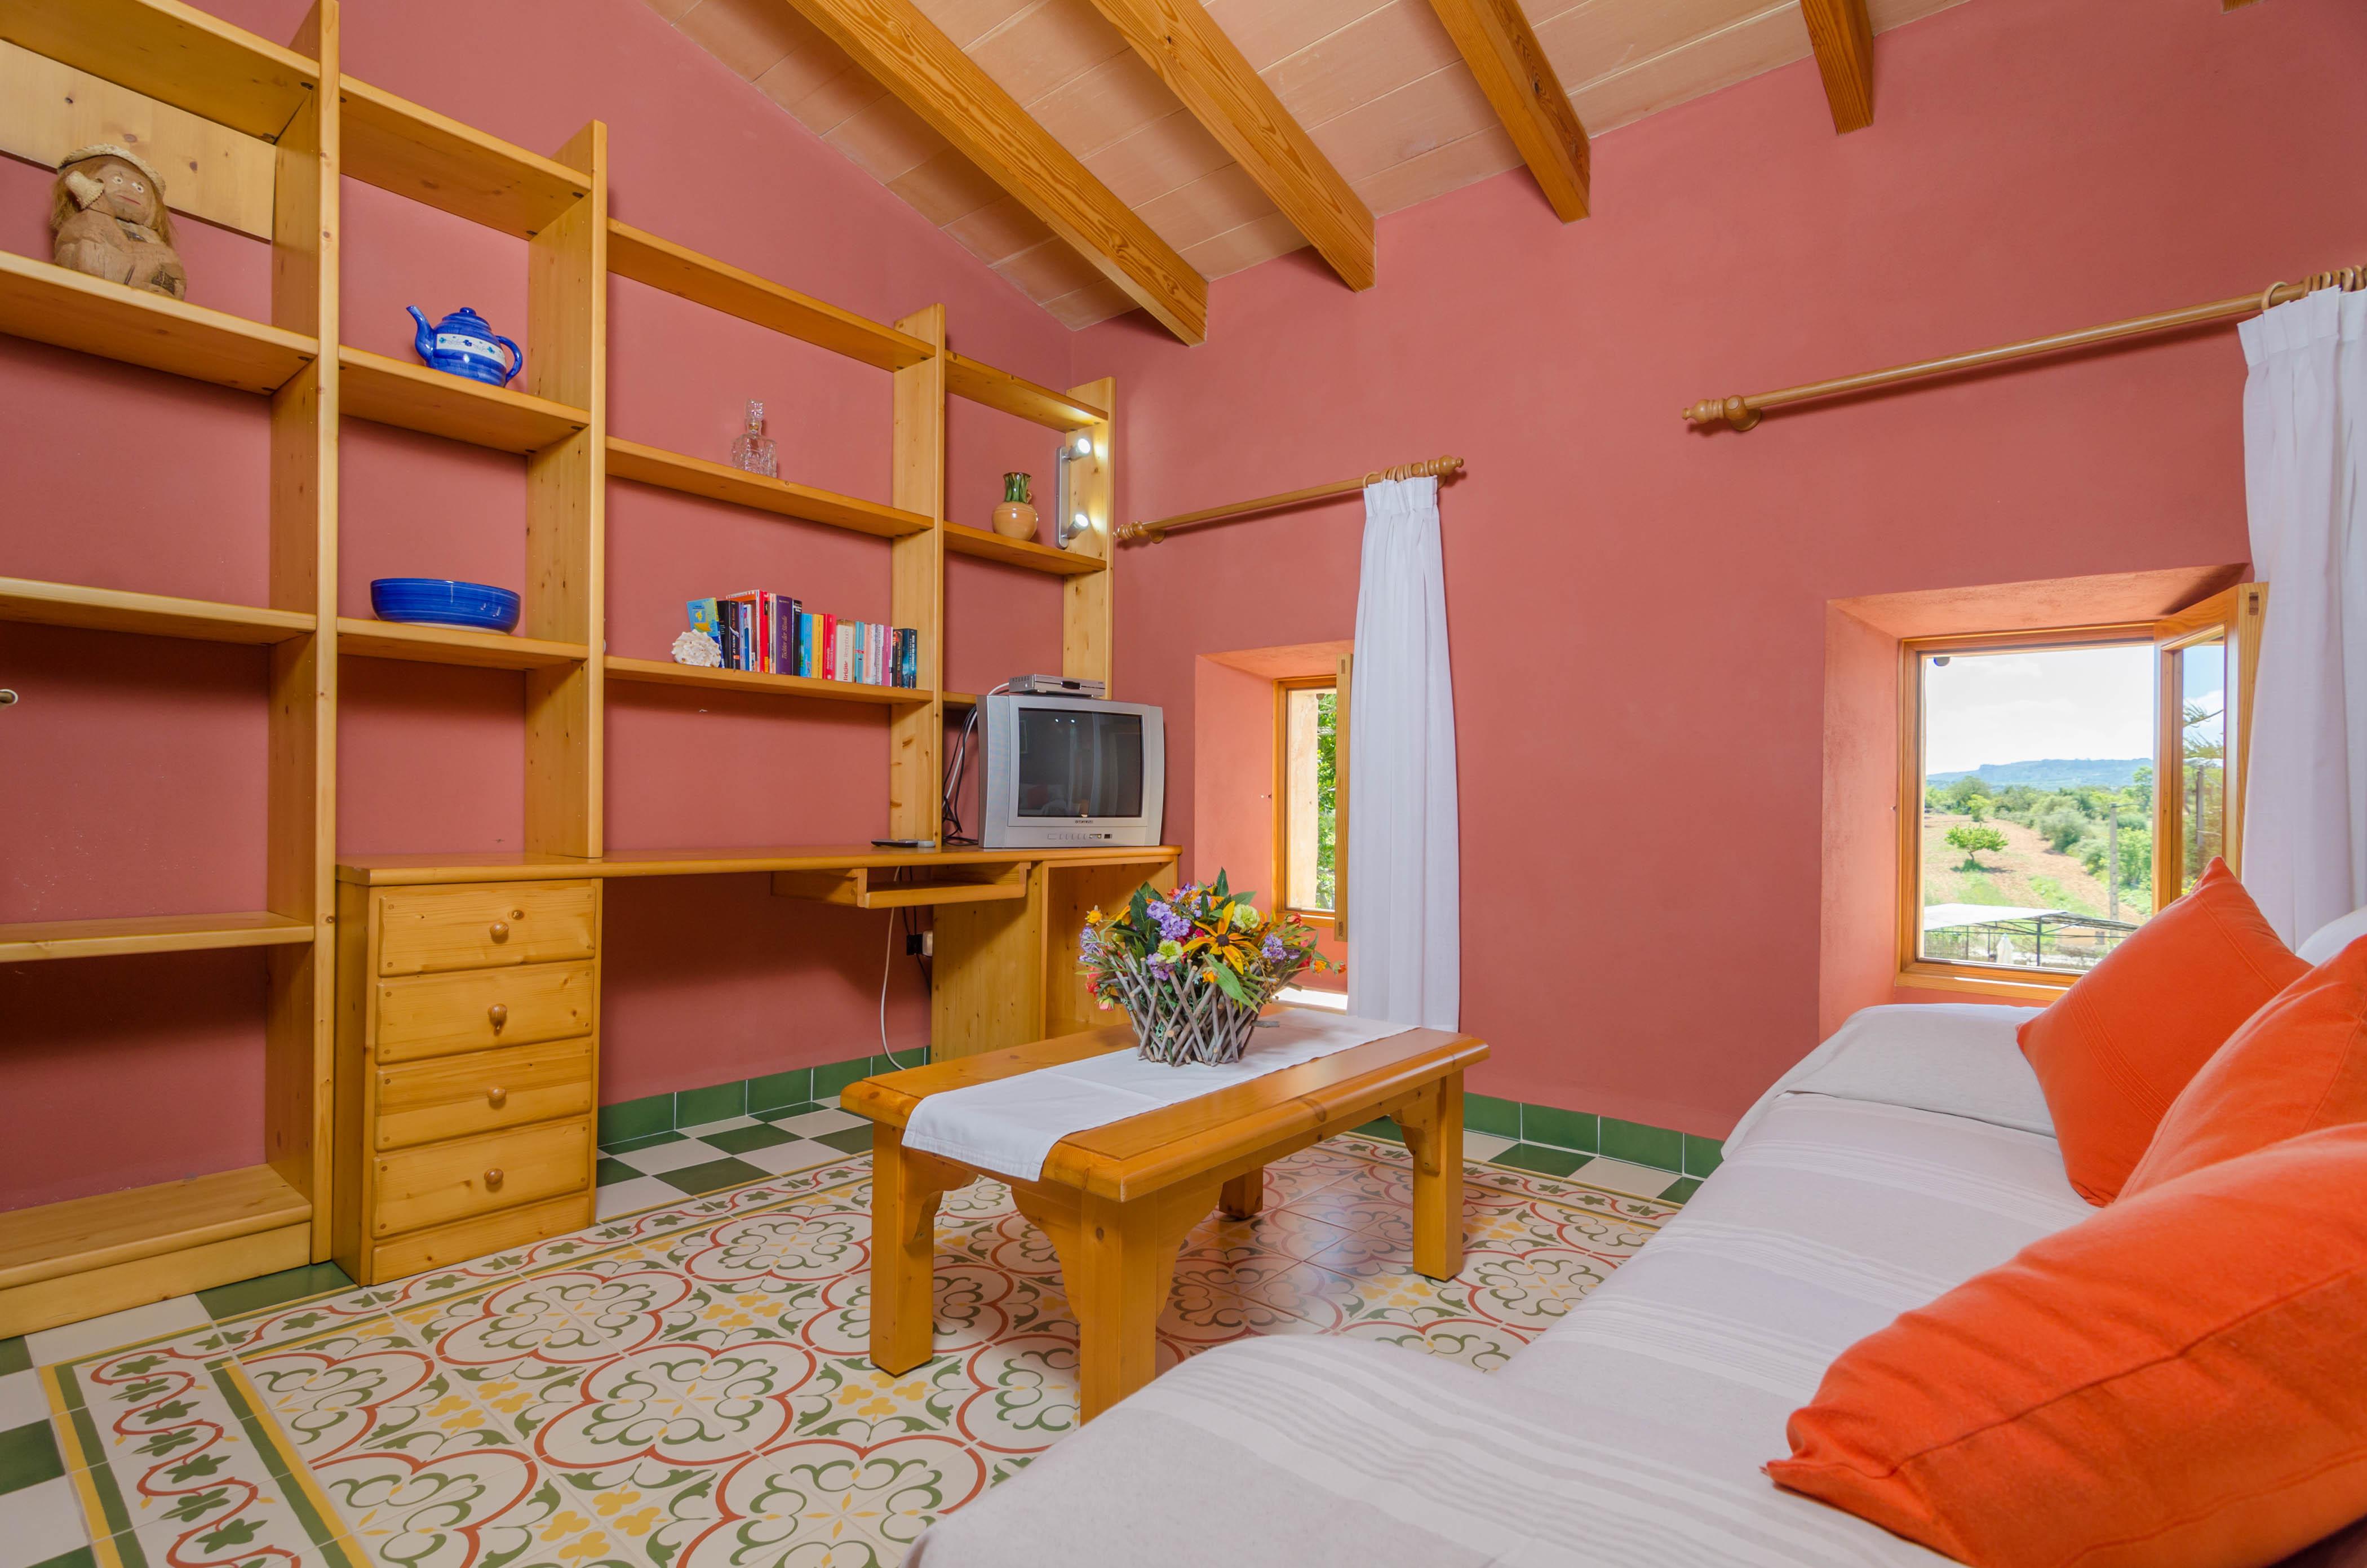 Ferienhaus SON MACIA (2186582), Son Macià, Mallorca, Balearische Inseln, Spanien, Bild 31